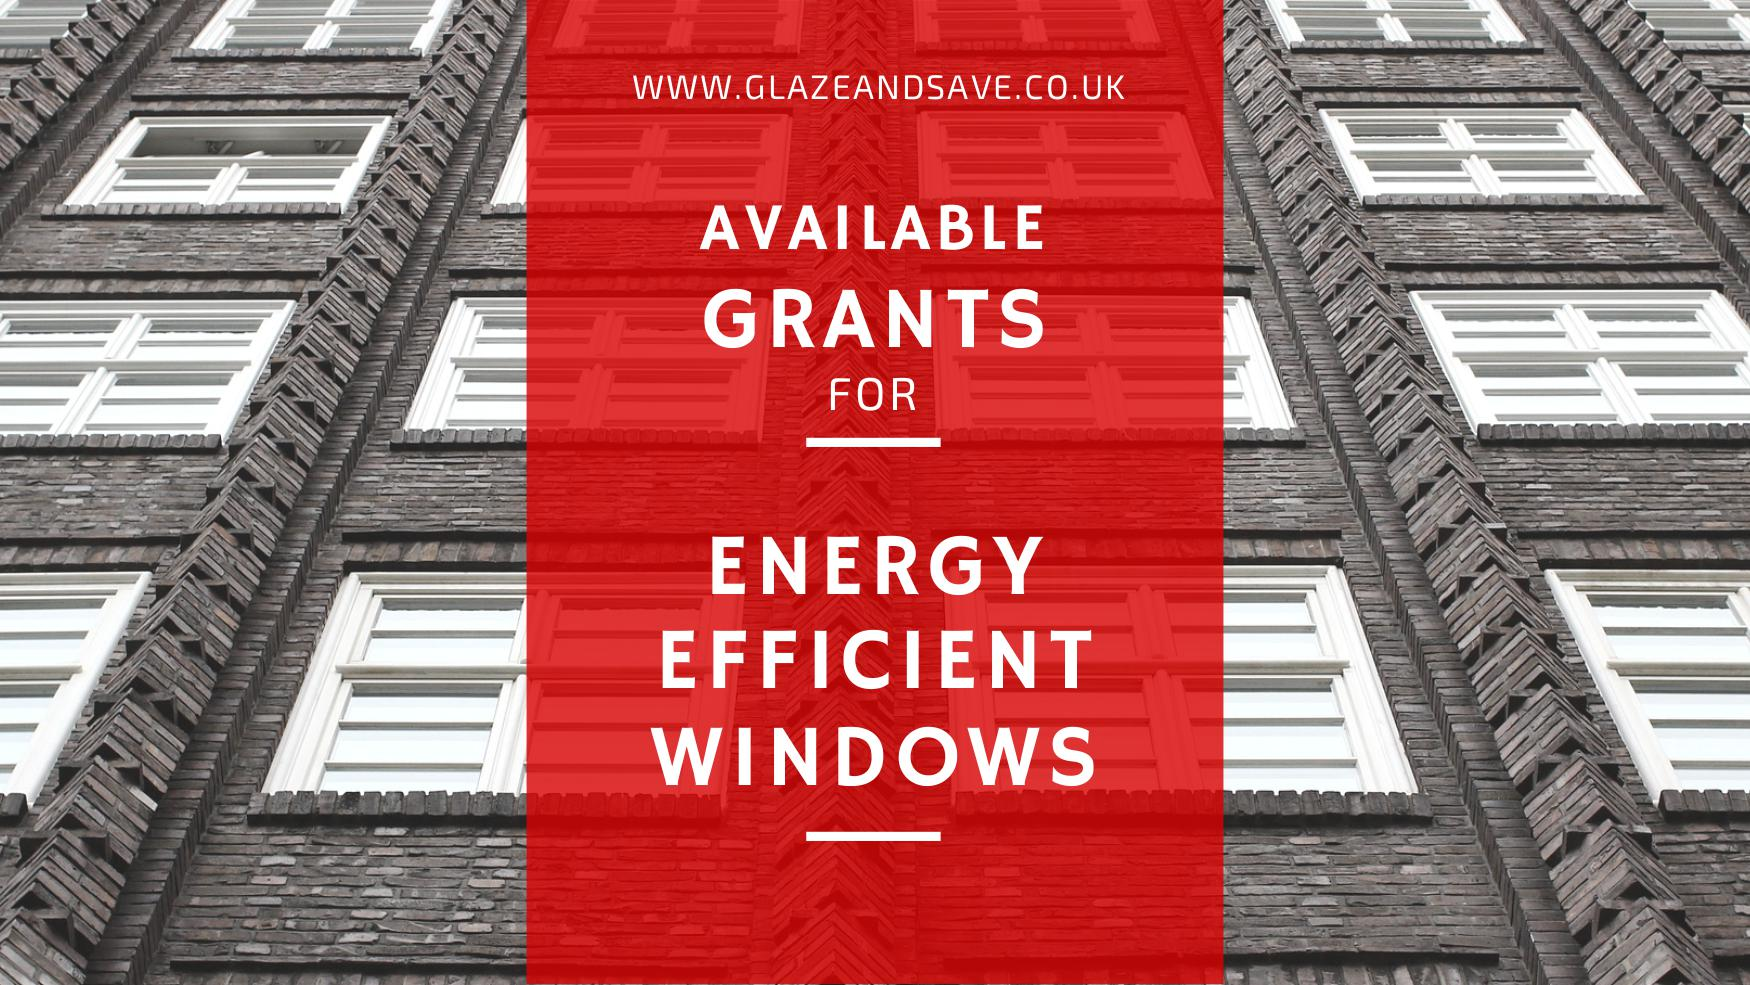 Available grants for energy efficient windows www.glazeandsave.co.uk